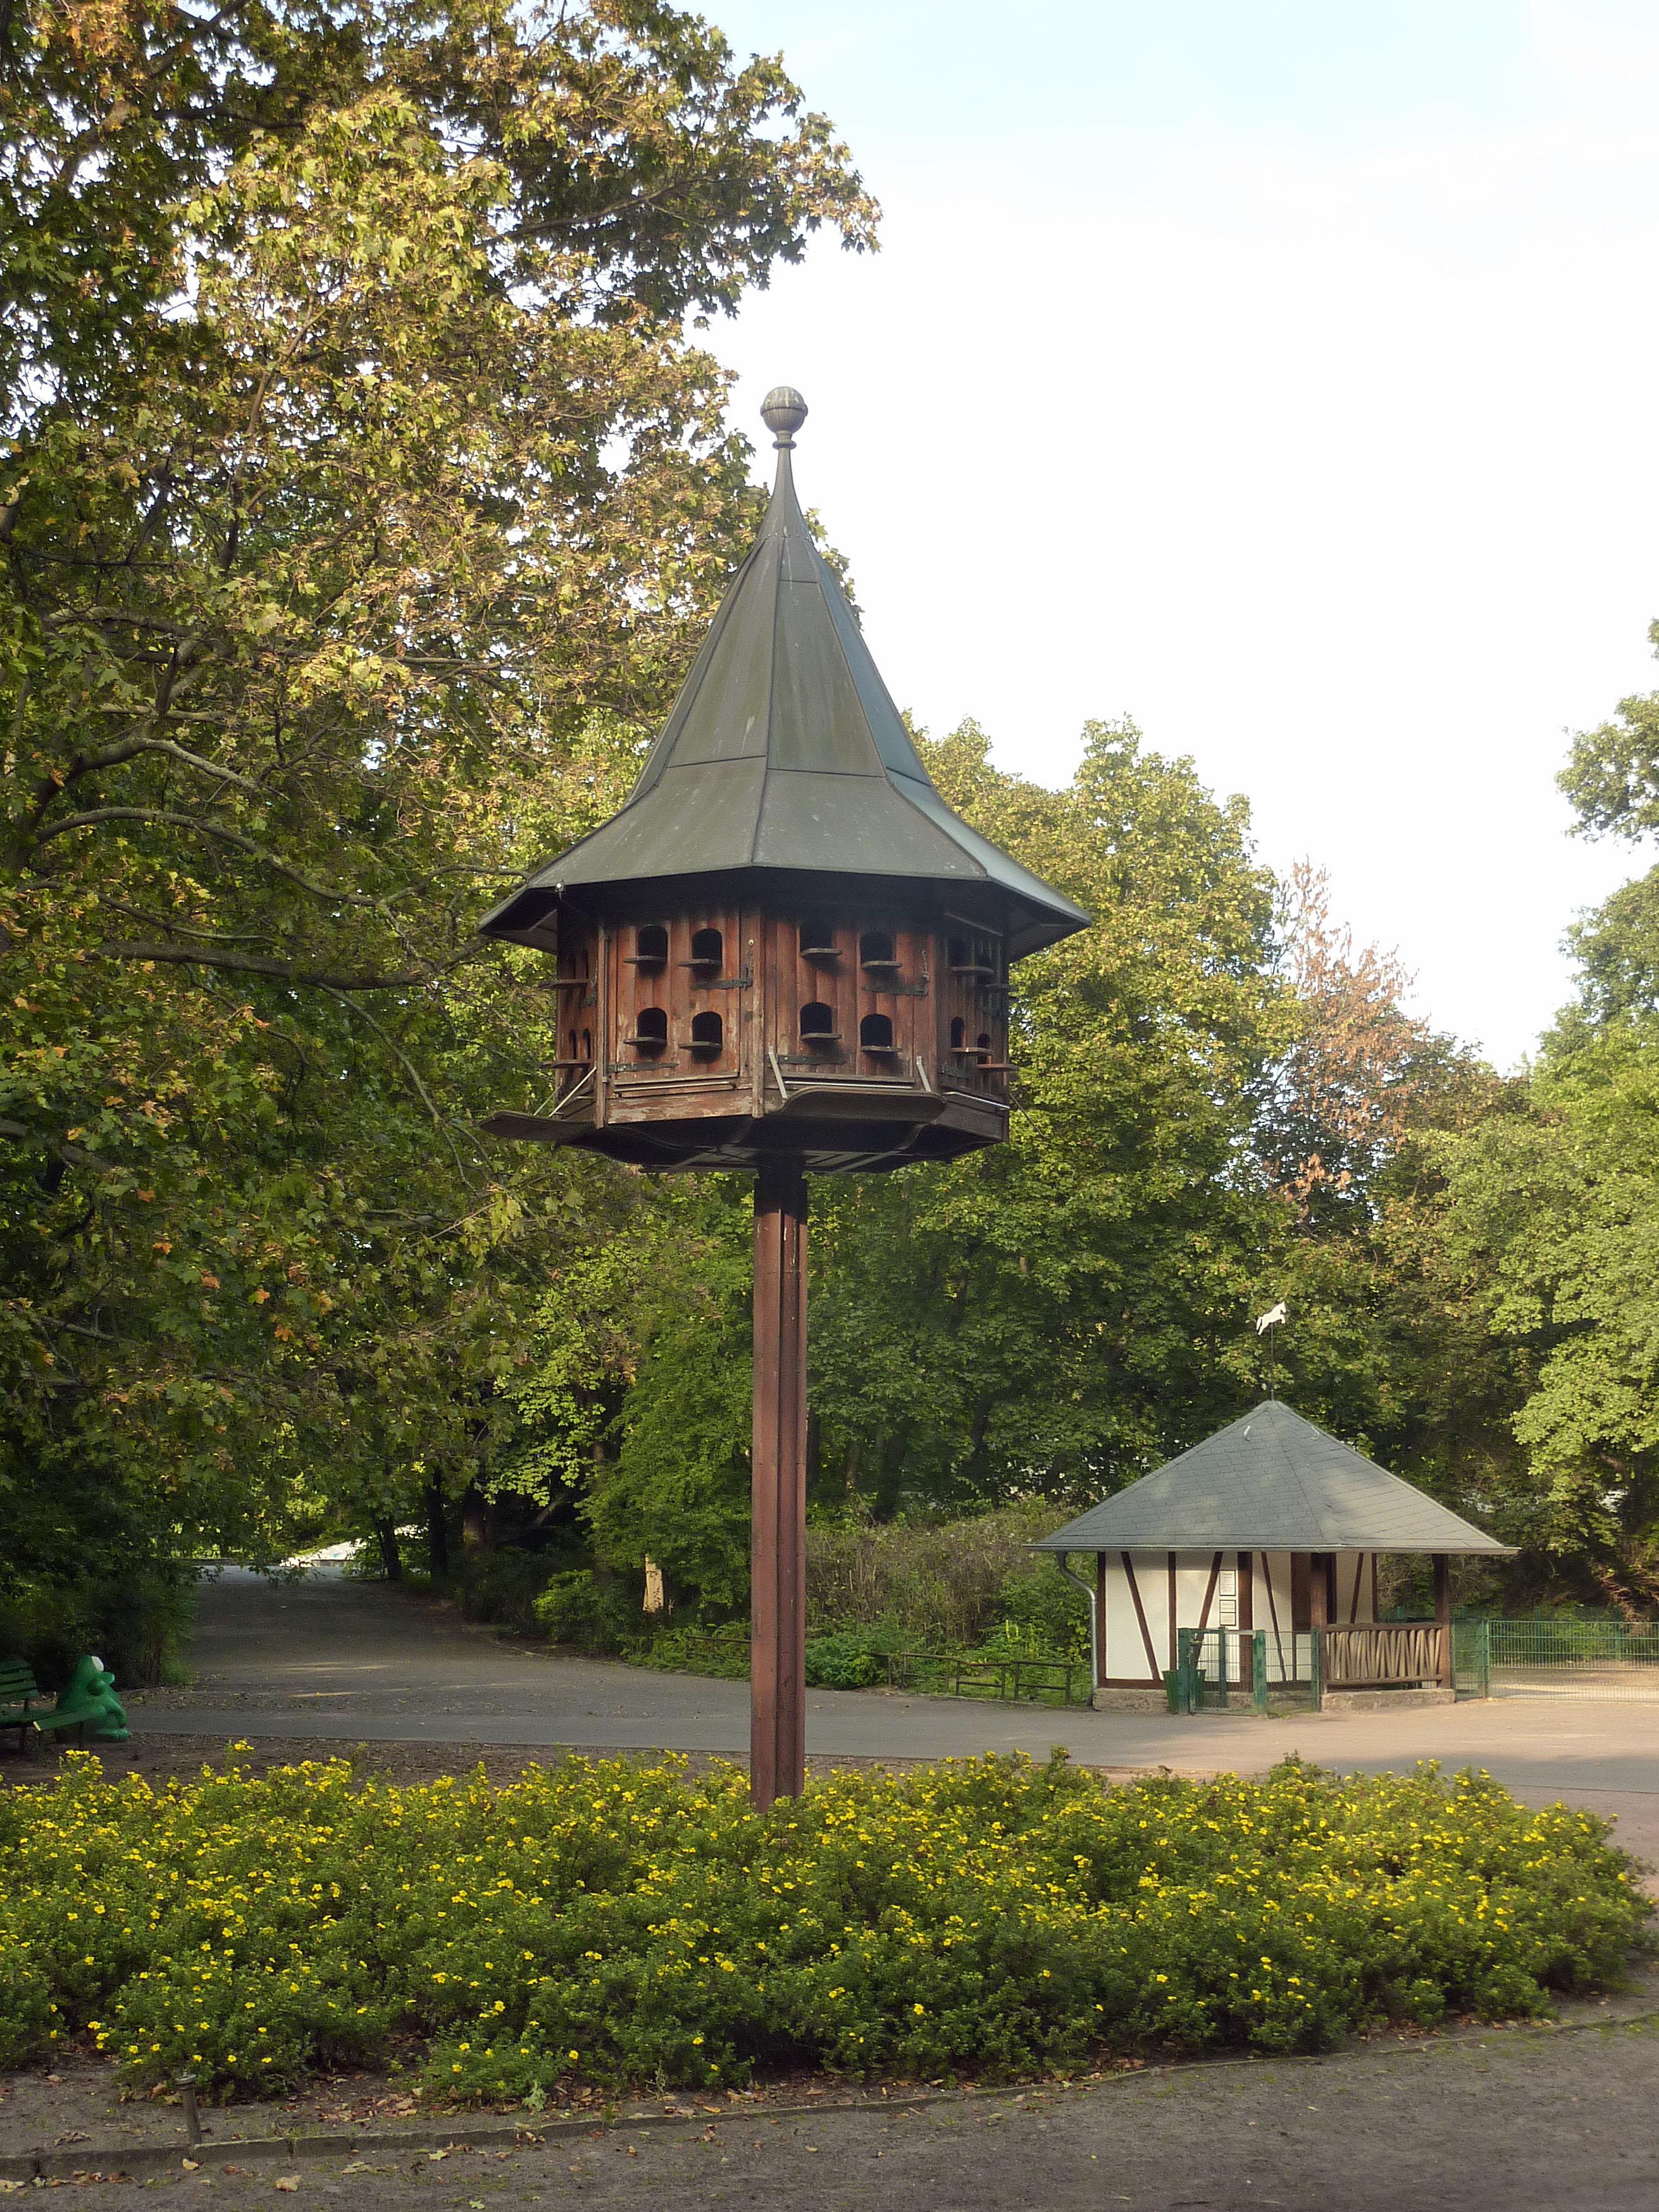 file taubenhaus tierpark berlin 620 wikimedia commons. Black Bedroom Furniture Sets. Home Design Ideas